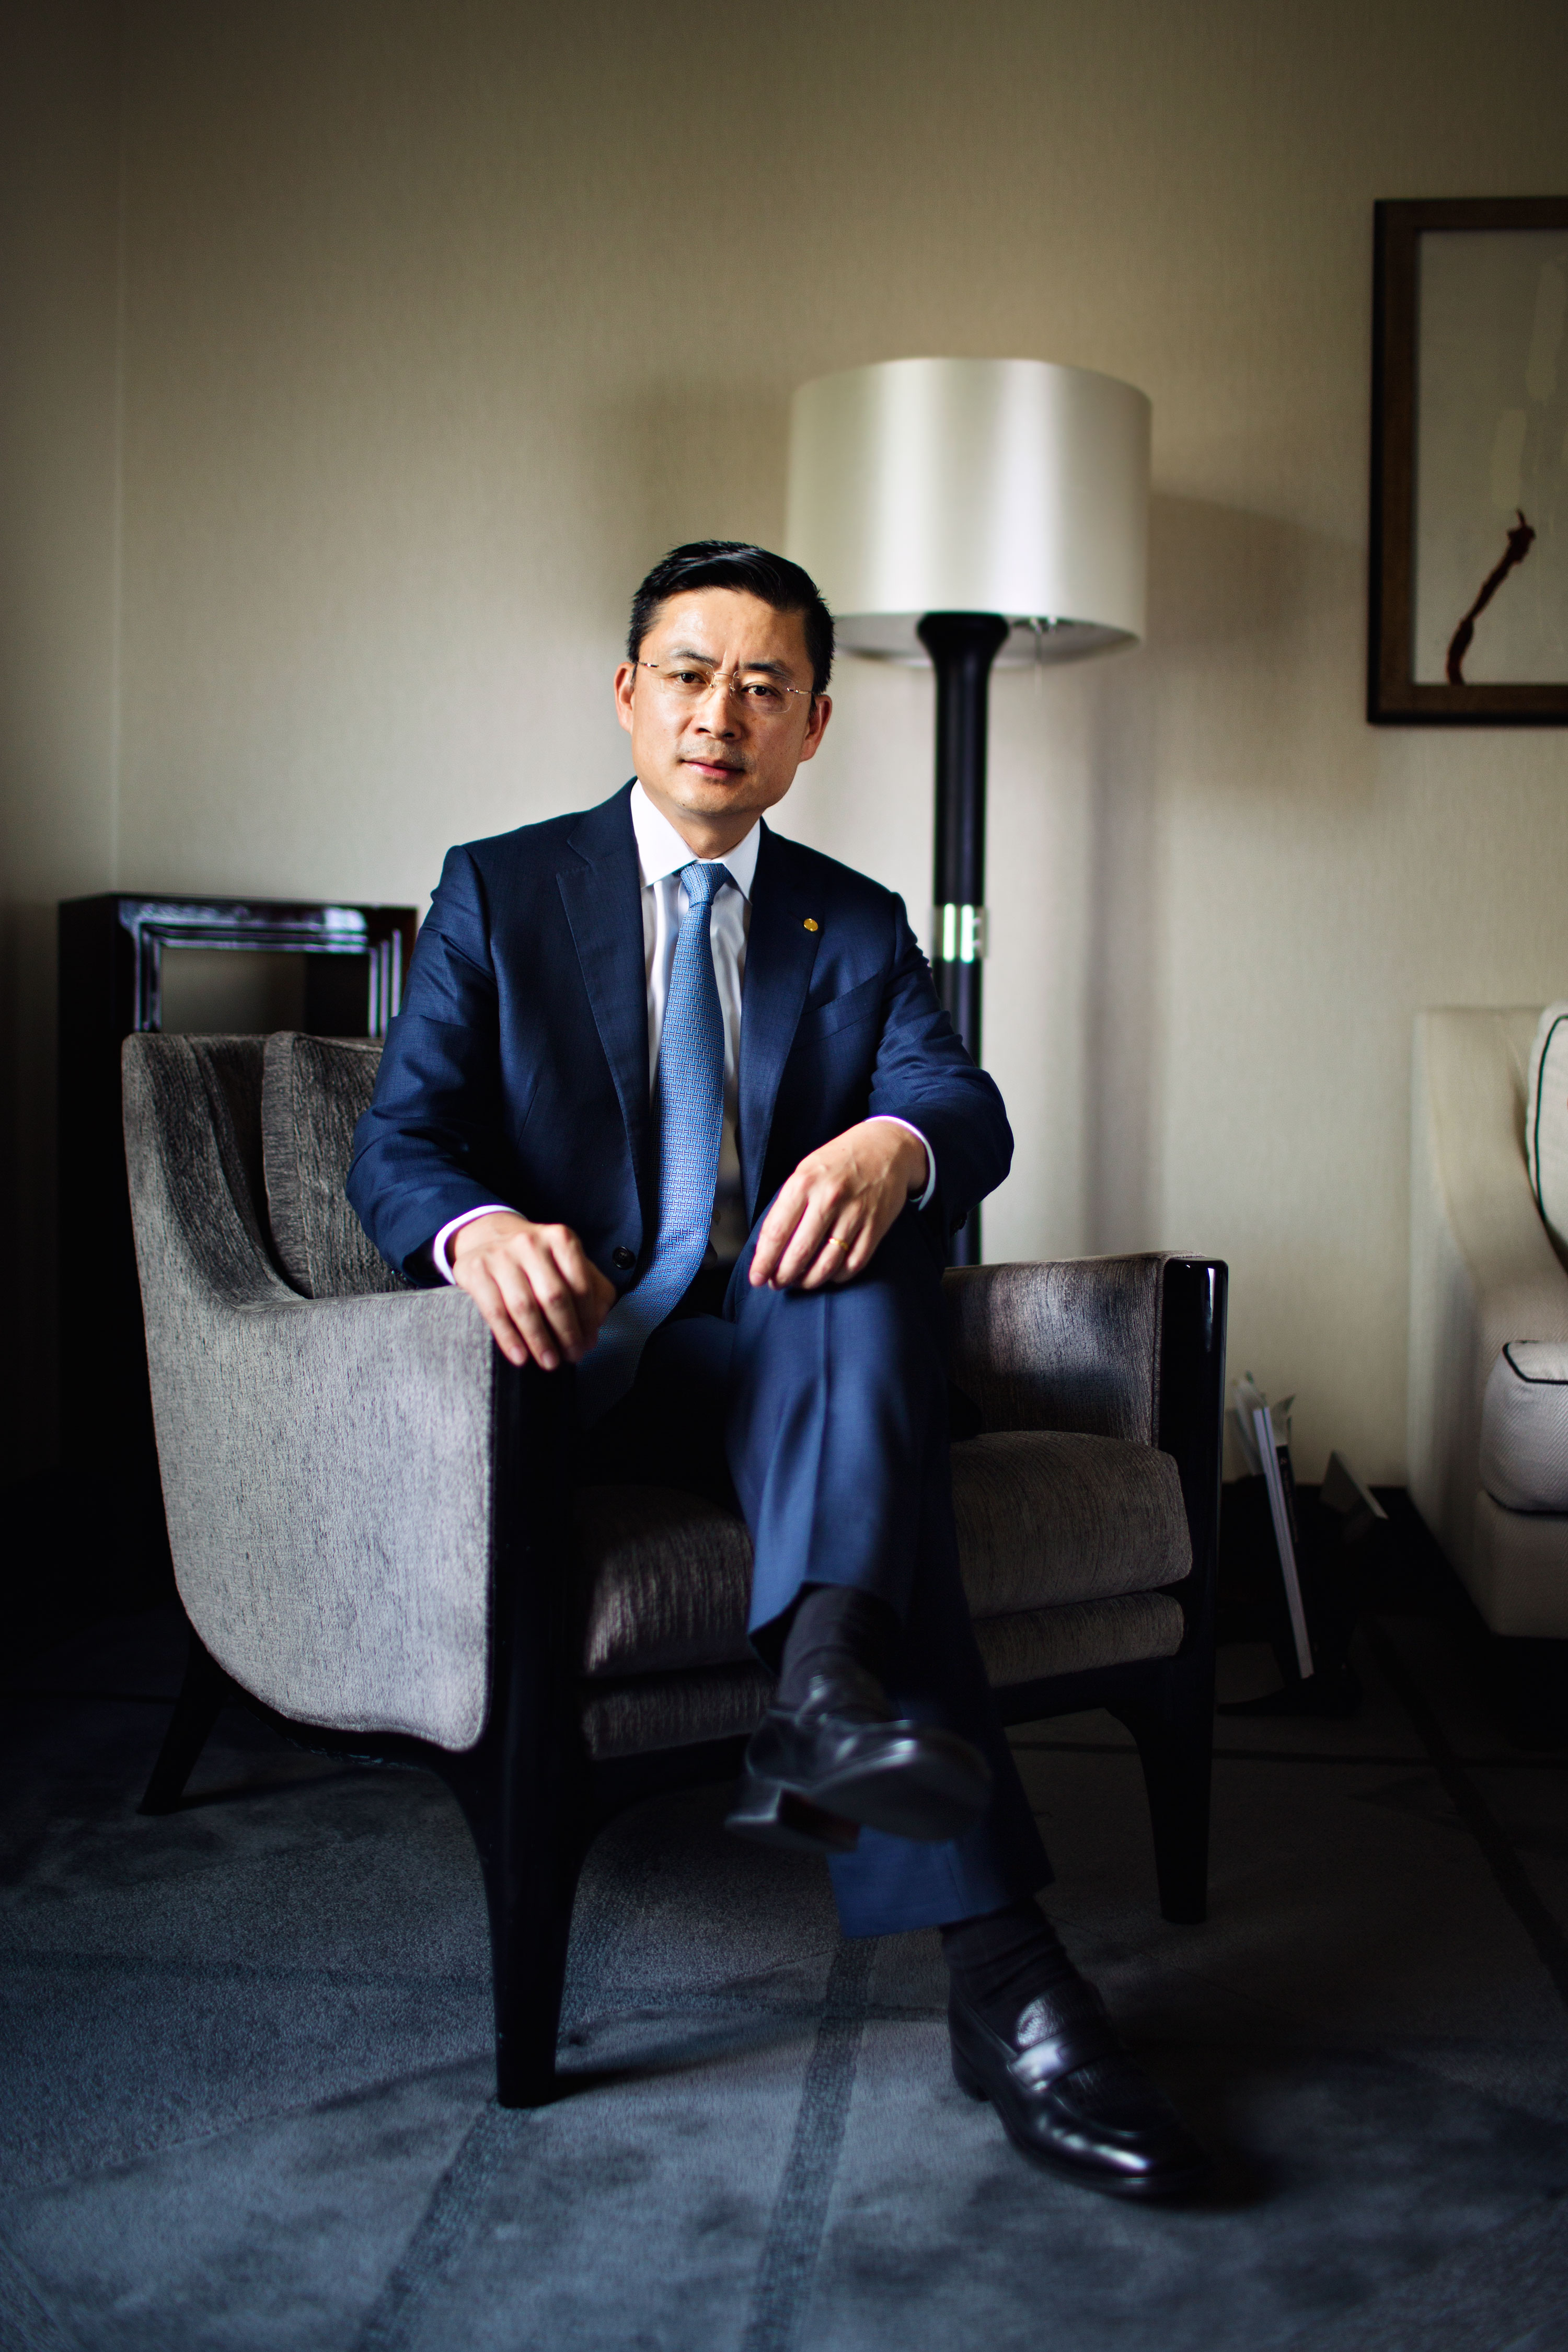 3 July, 2017 -Peninsula Hotel,Paris, France. -- PHOTO: Adam Tan, CEO of HNA.--Photographer: Julie Glassberg for Fortune.--